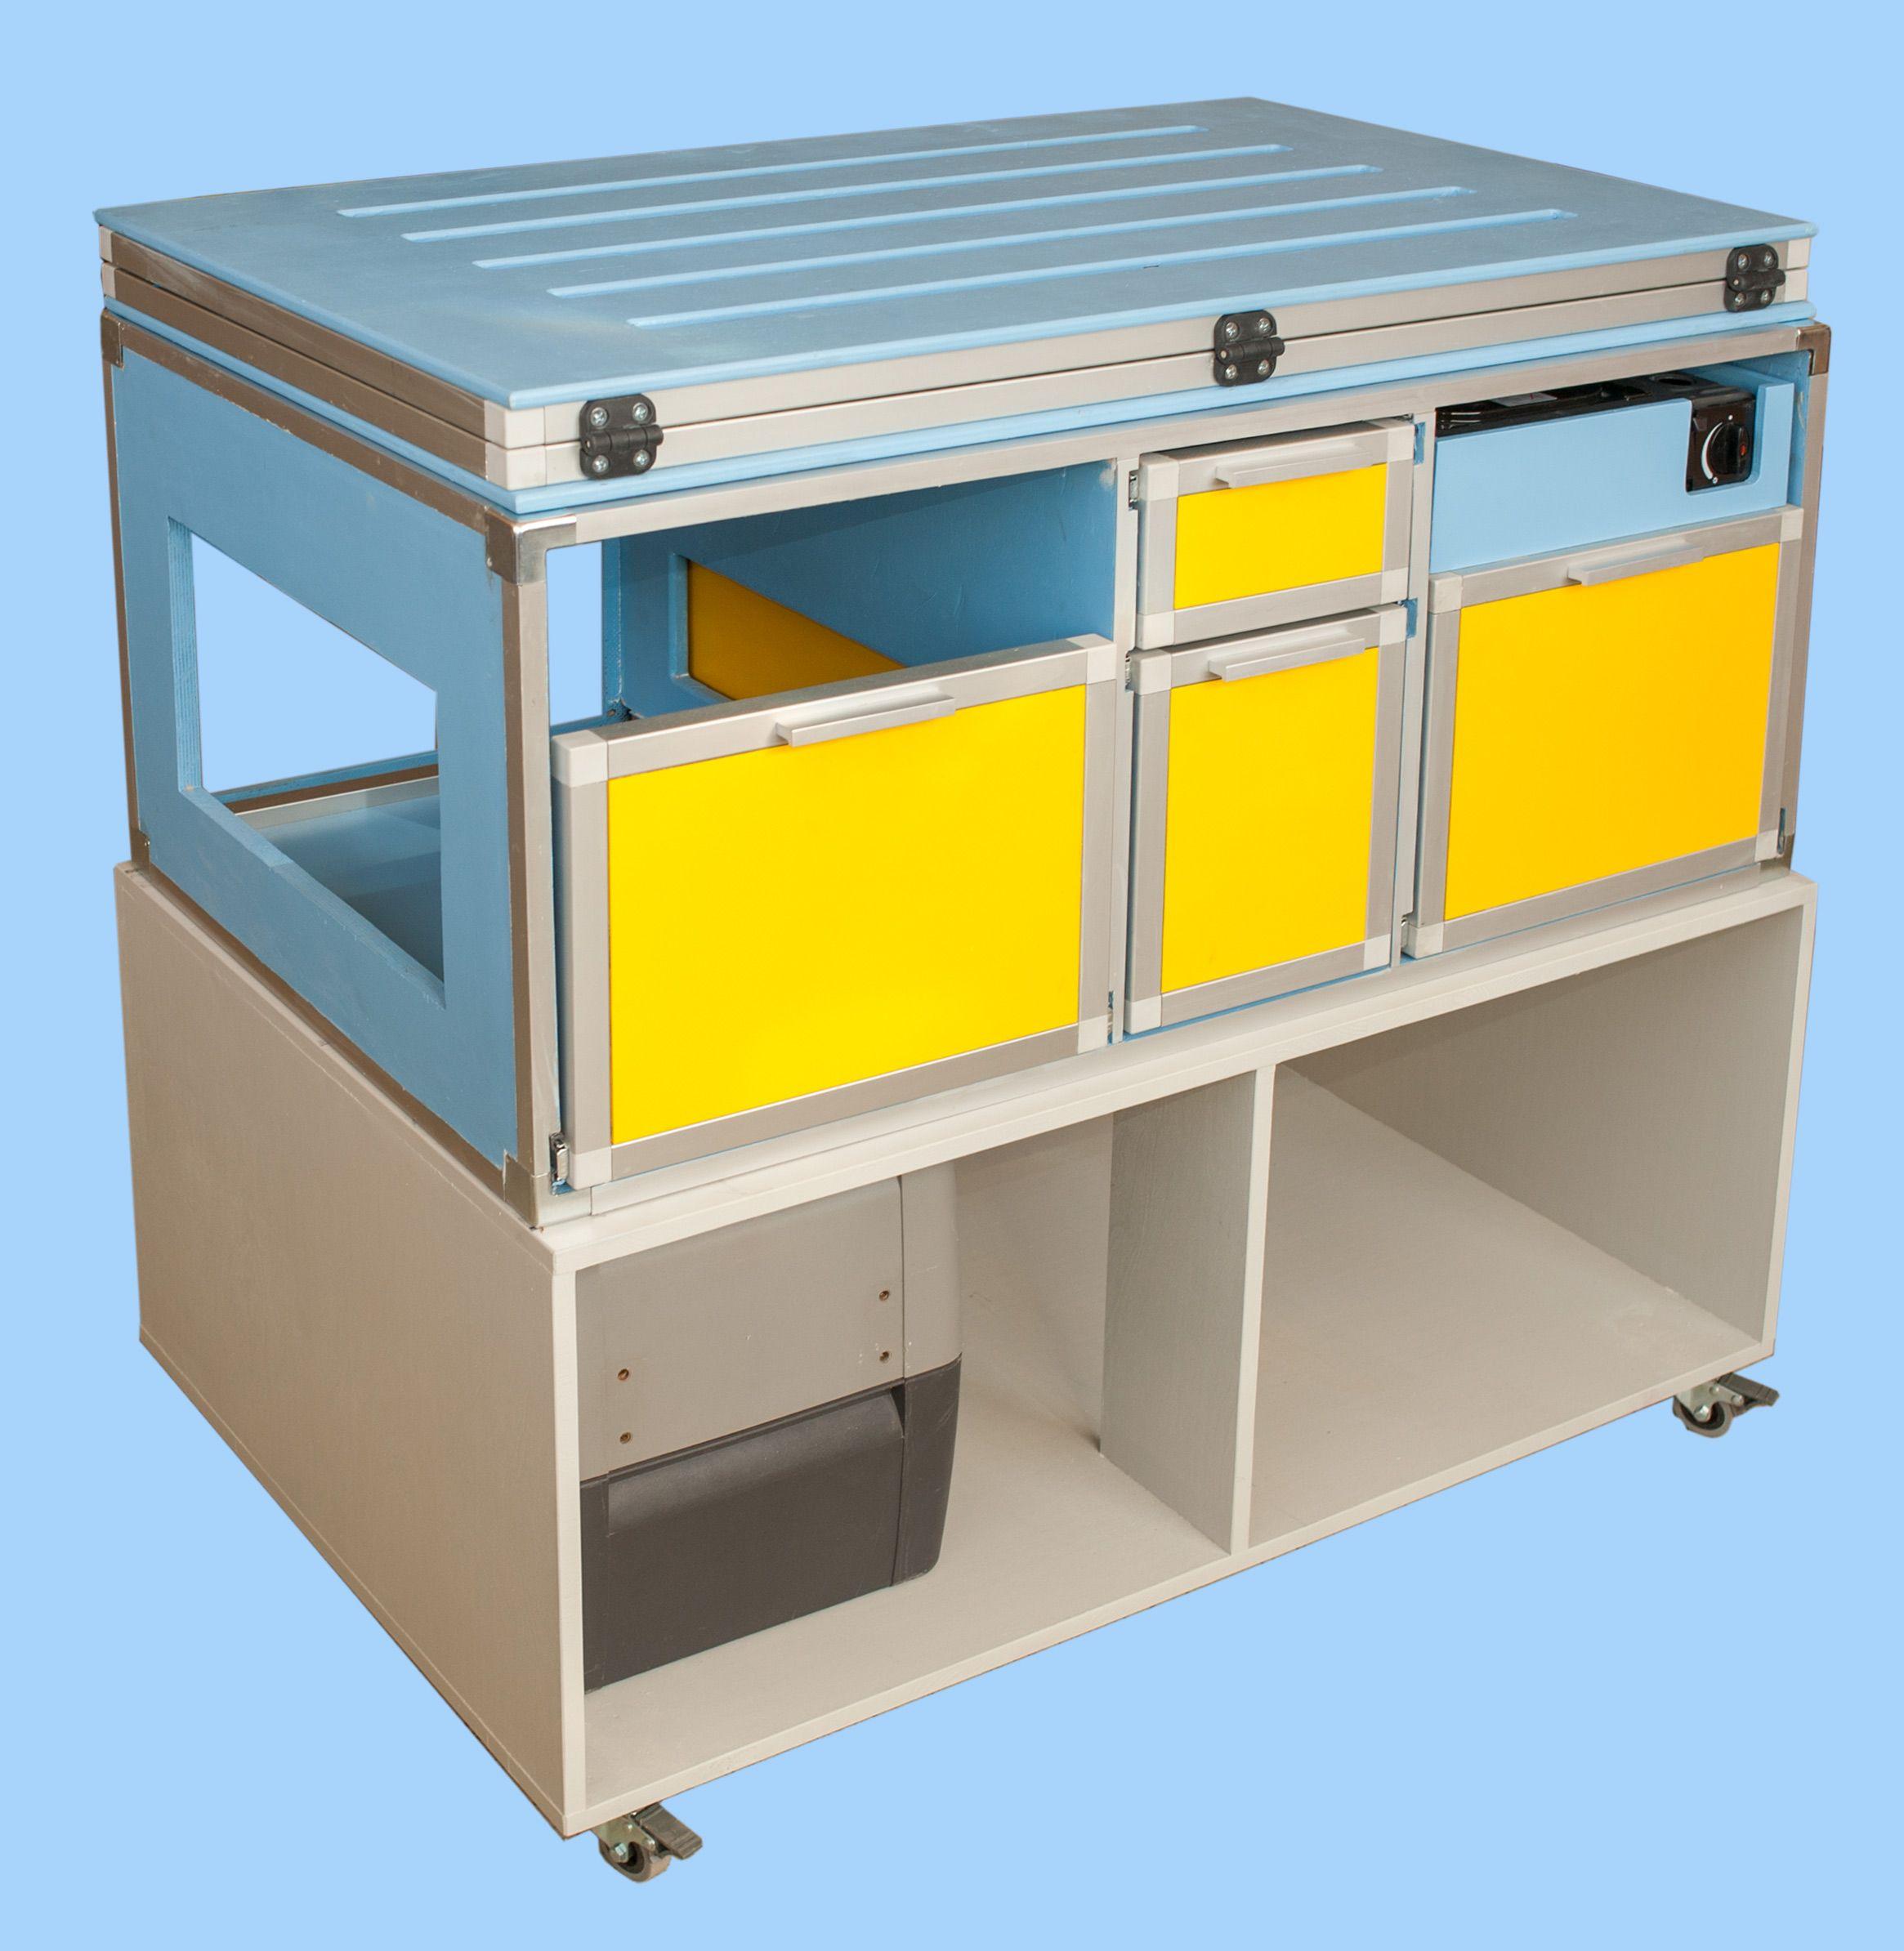 camping module f r minivan und hochdachkombi smart camper. Black Bedroom Furniture Sets. Home Design Ideas